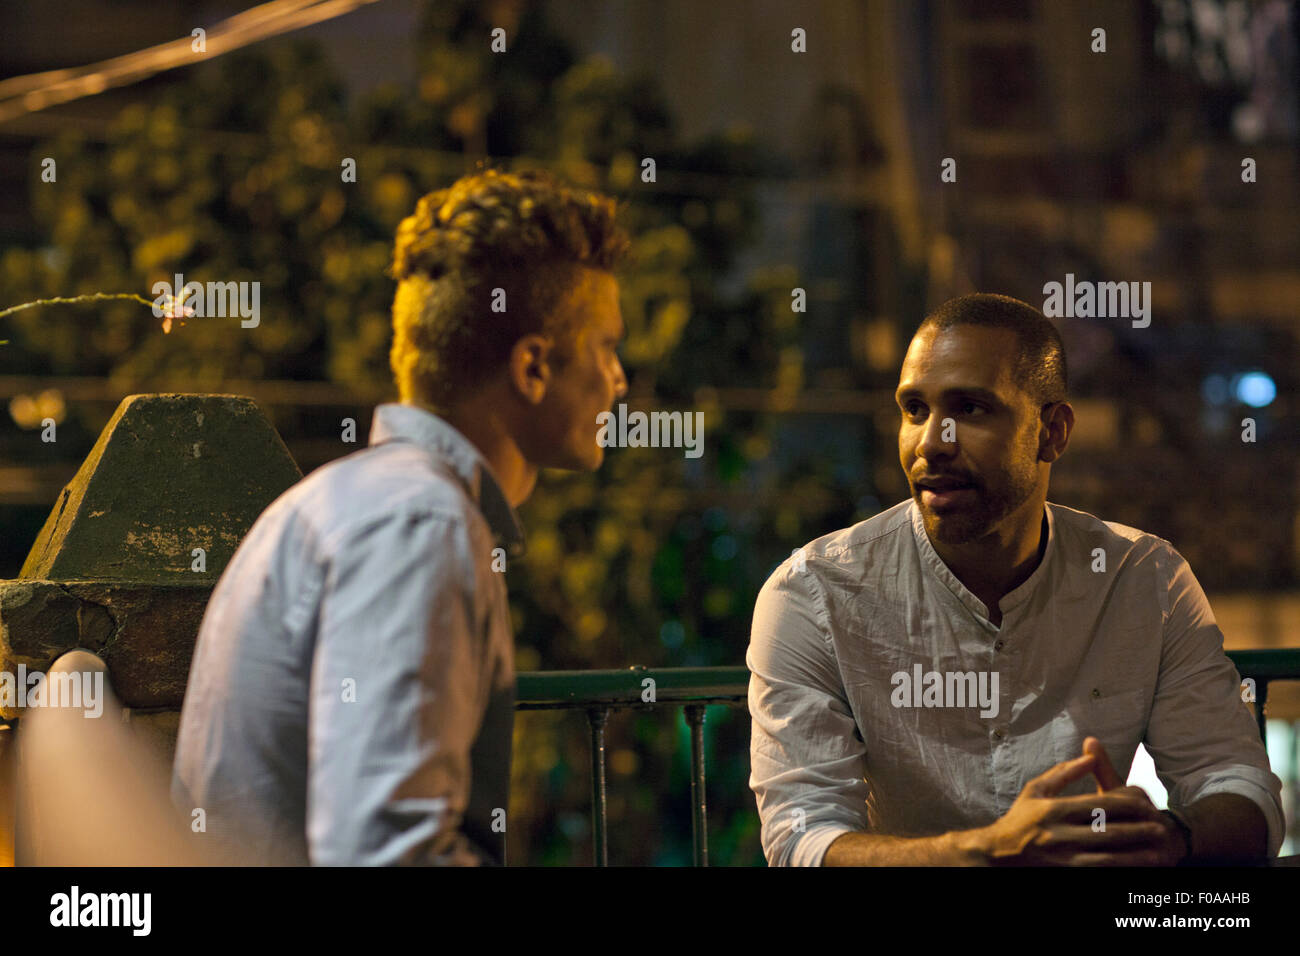 Two men sitting at table at bar, talking - Stock Image